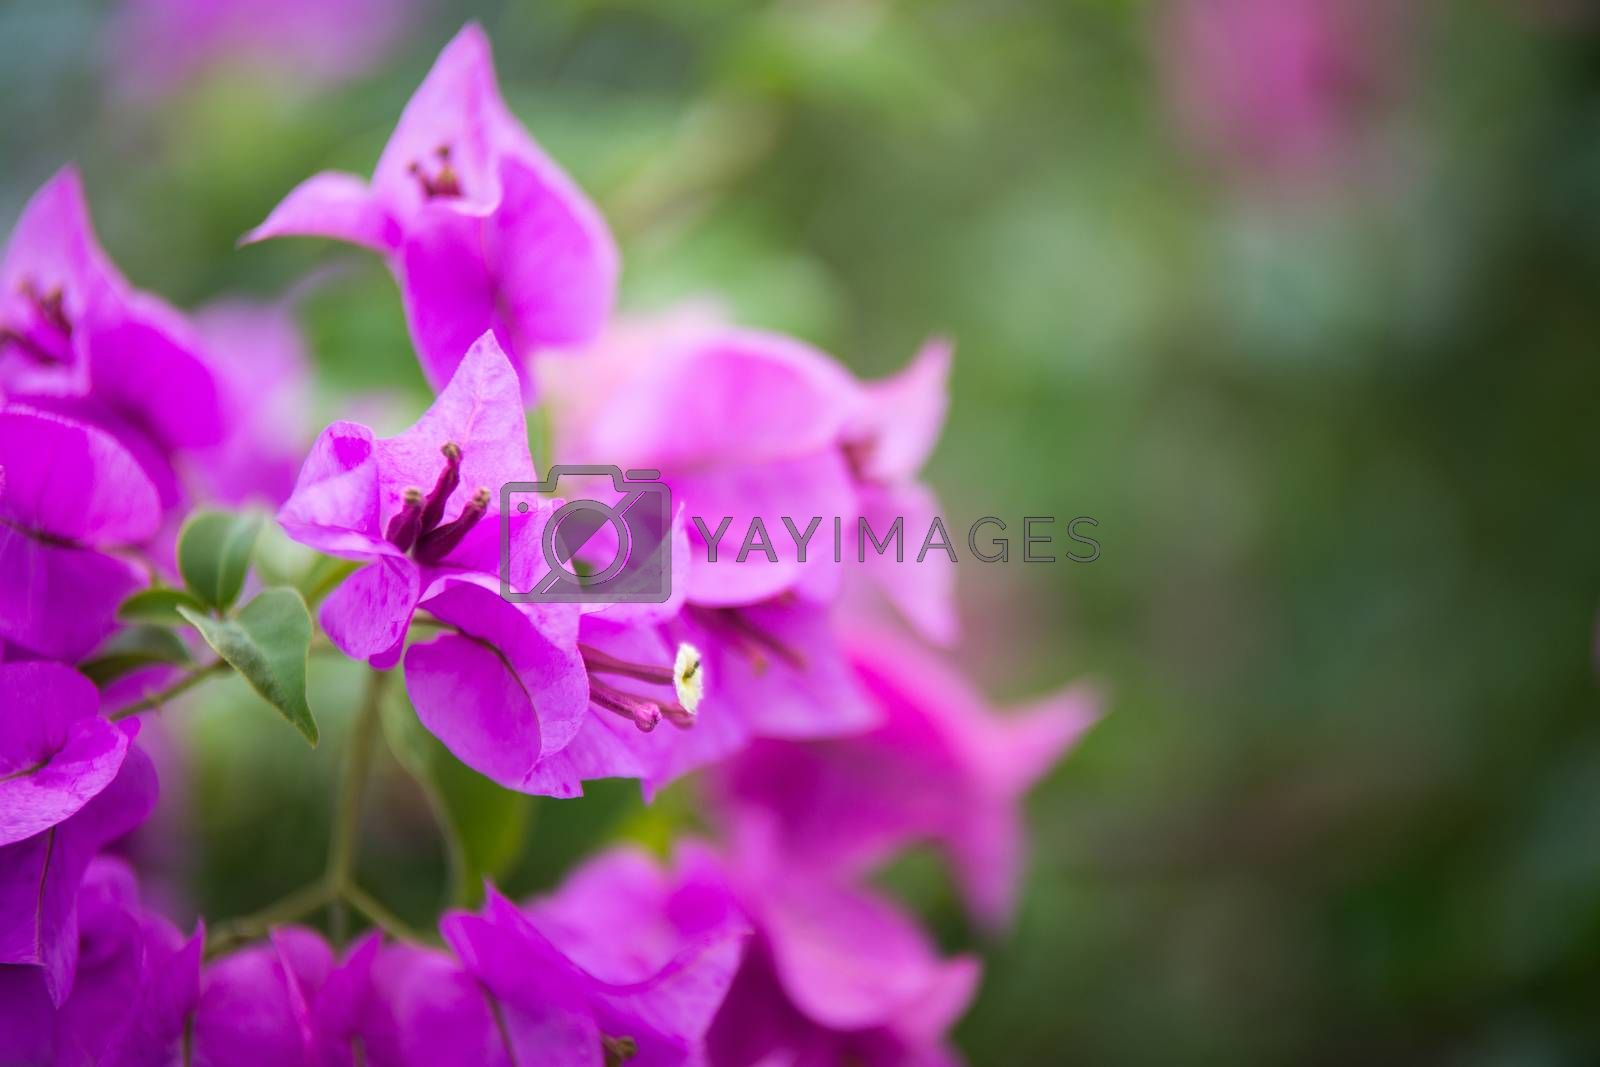 Bougainvillea blooms in the garden, soft focus by jakgree